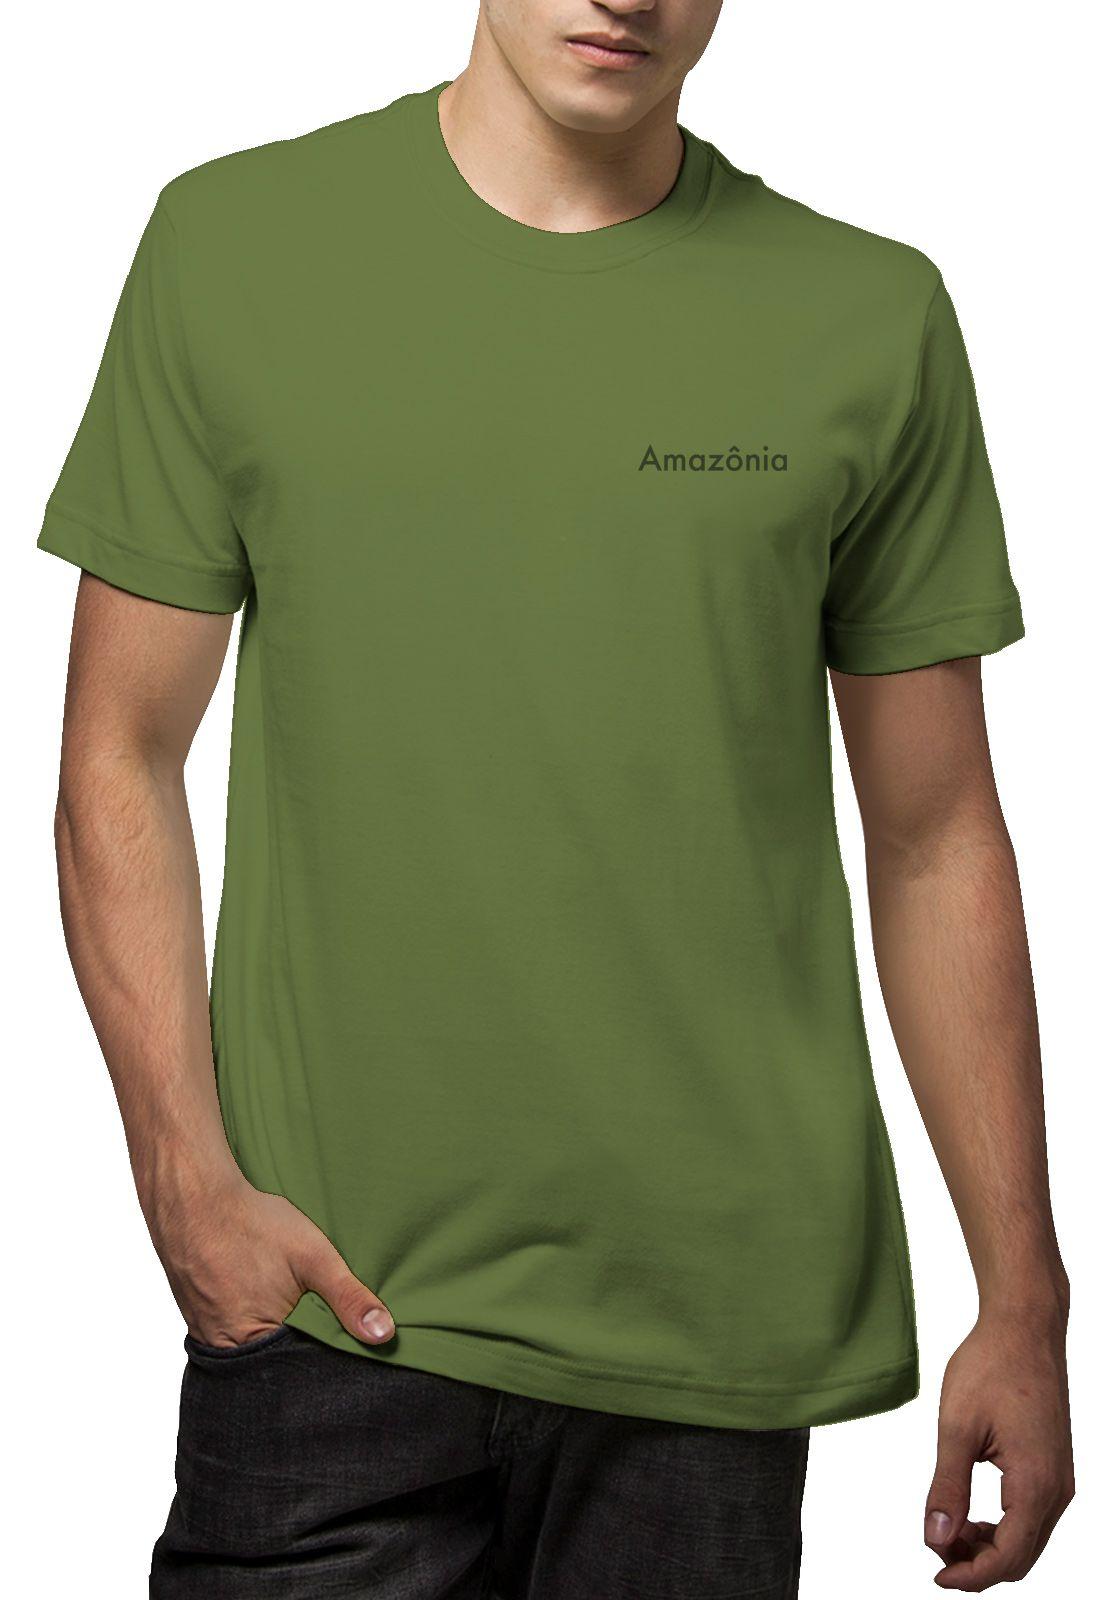 Camiseta Amazônia Mandala Planta - Verde